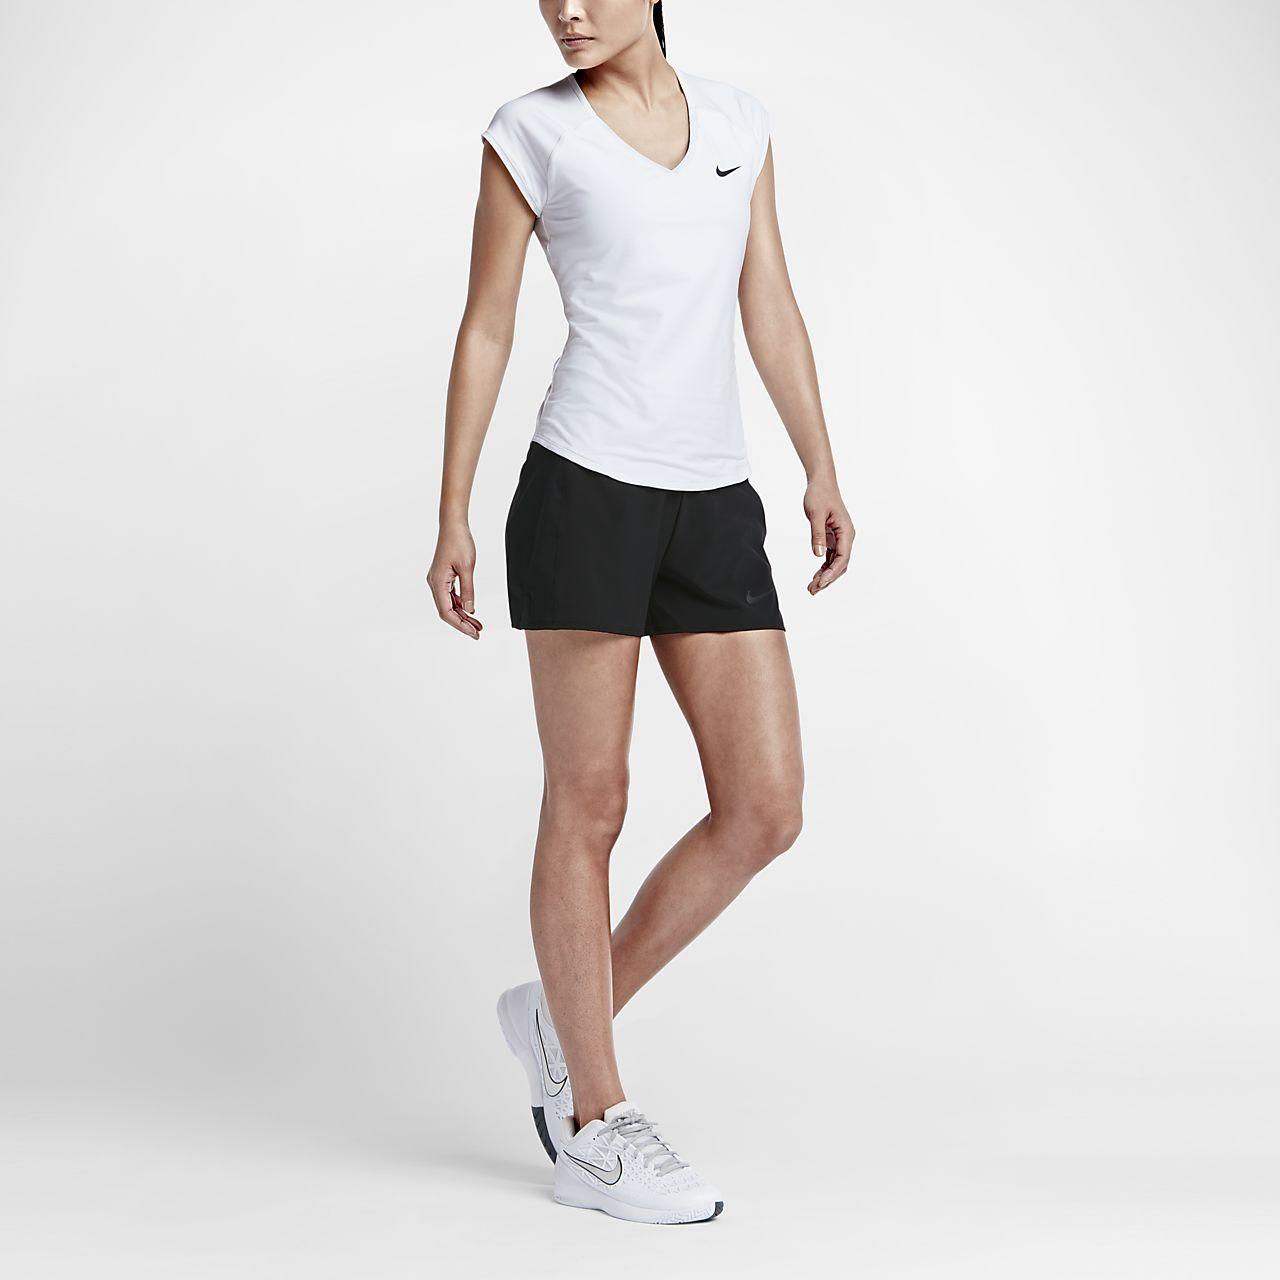 Dámské tenisové tričko NikeCourt Pure